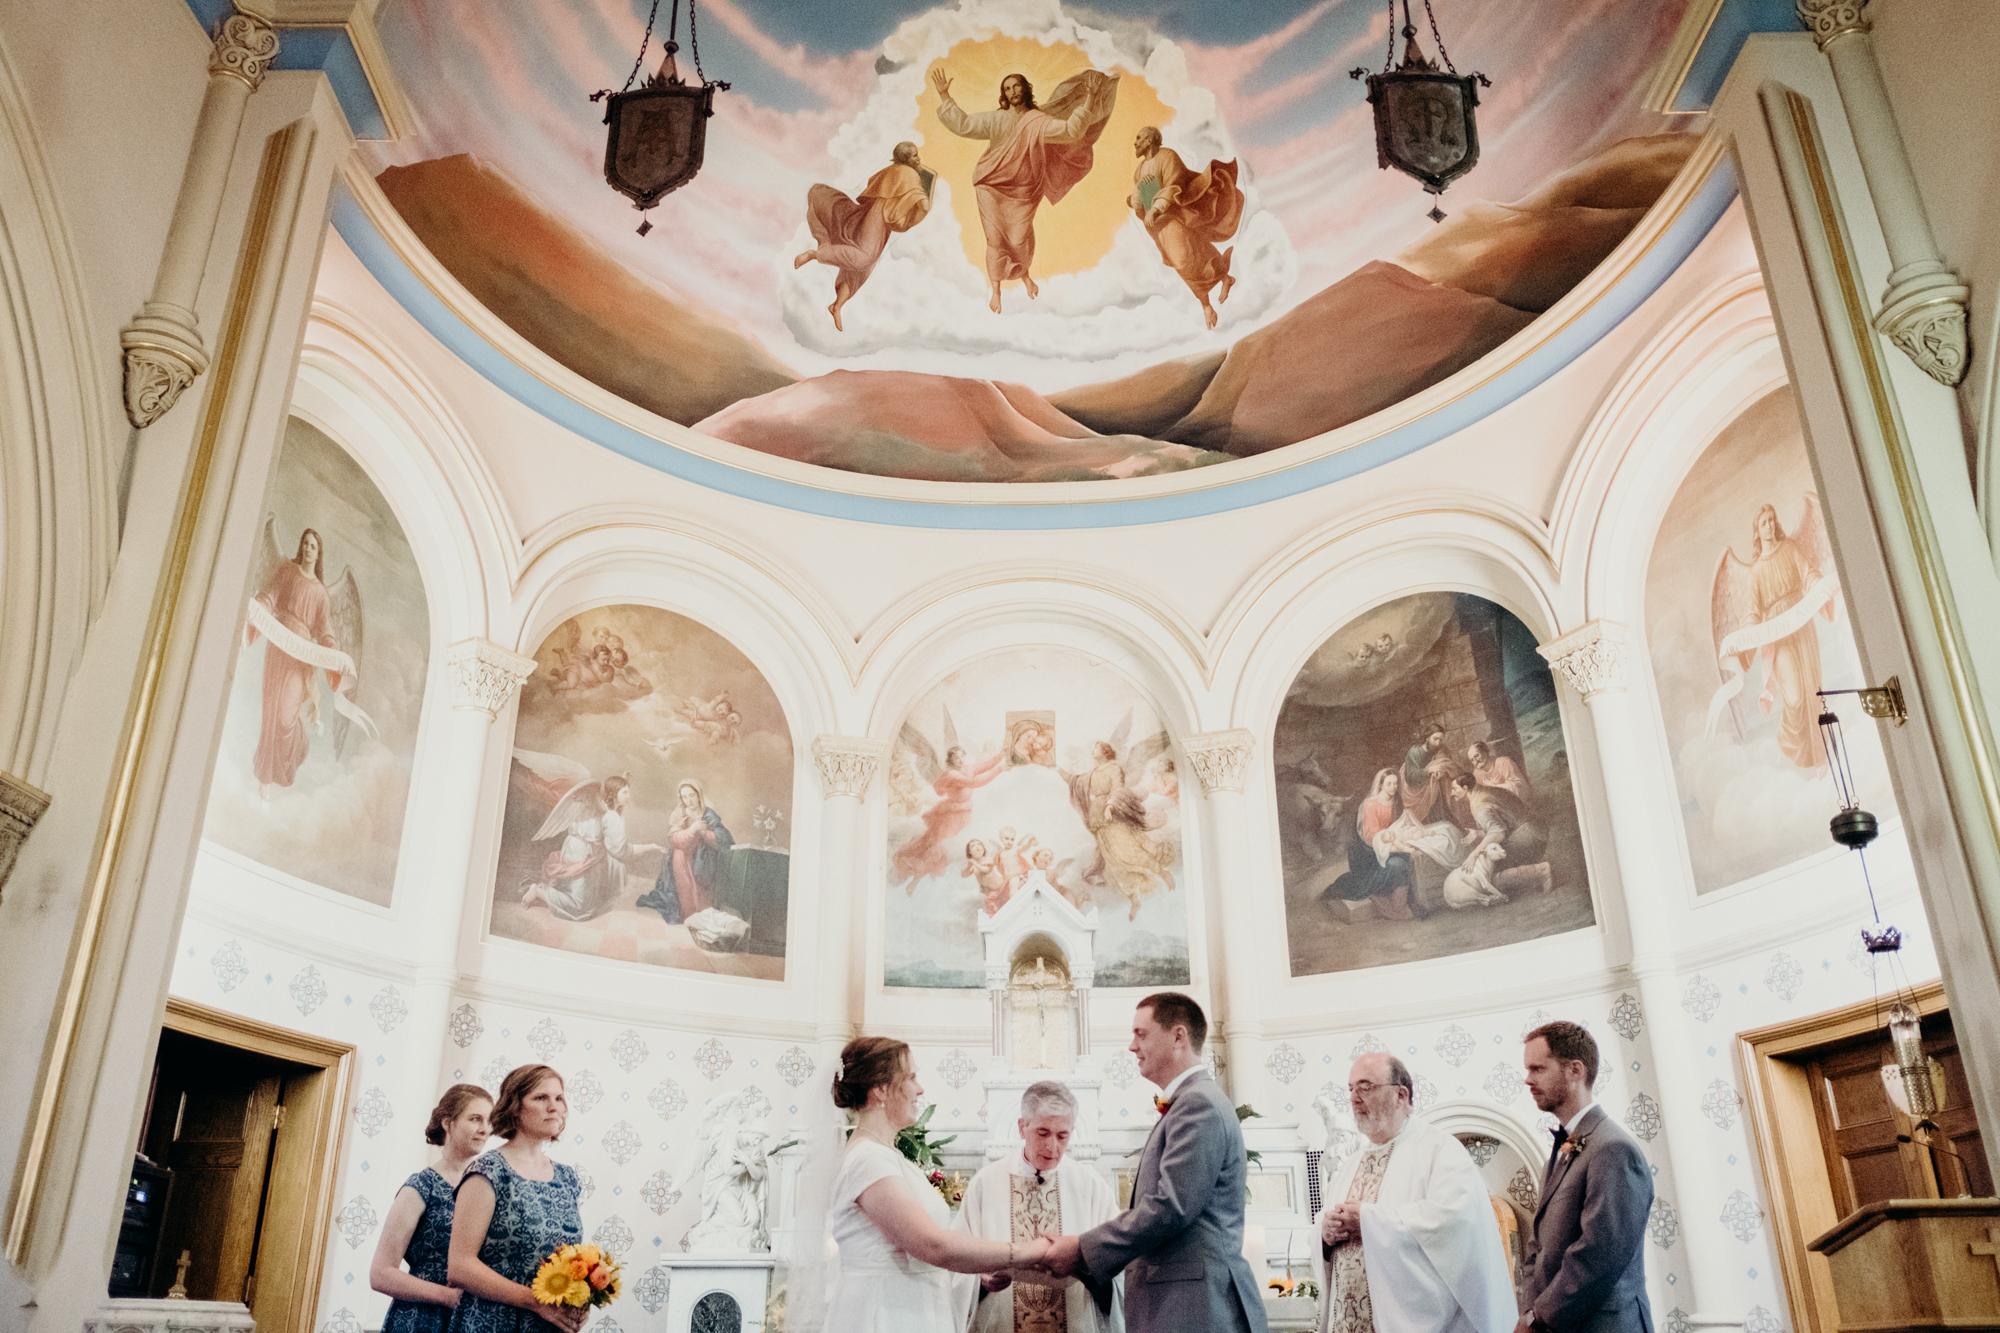 catholic-social-teaching-wedding-13.jpg